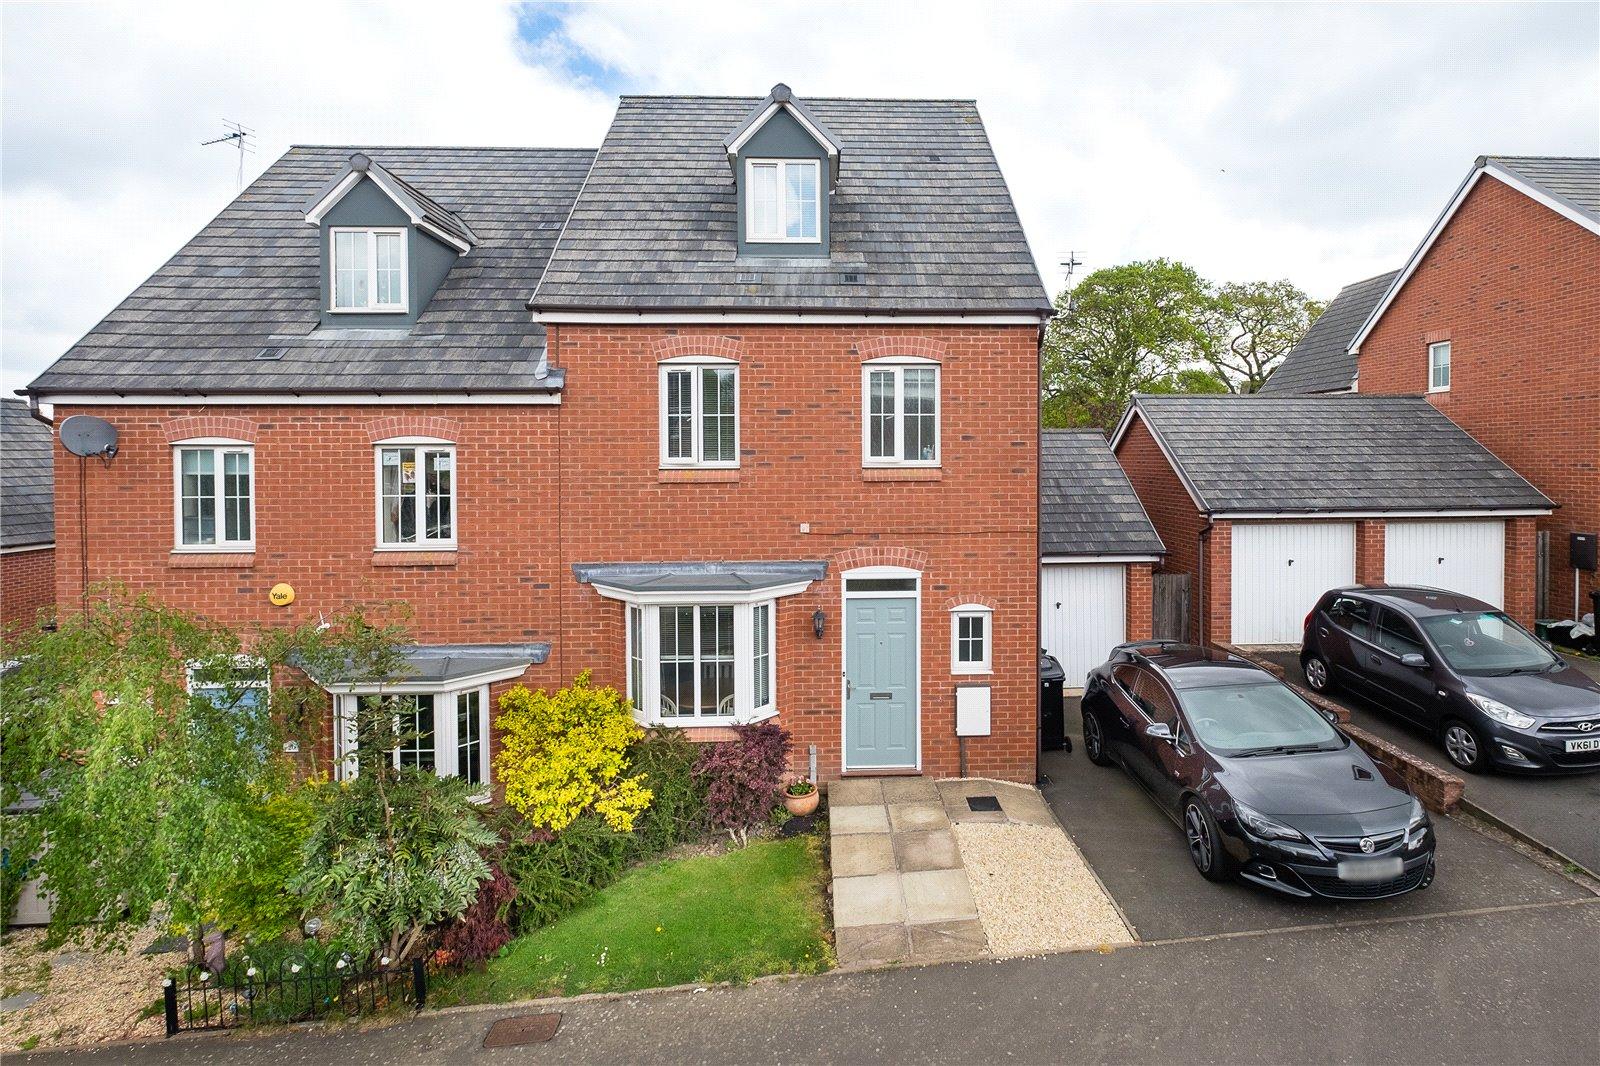 19 Catherton Road, Cleobury Mortimer, Kidderminster, Shropshire, DY14